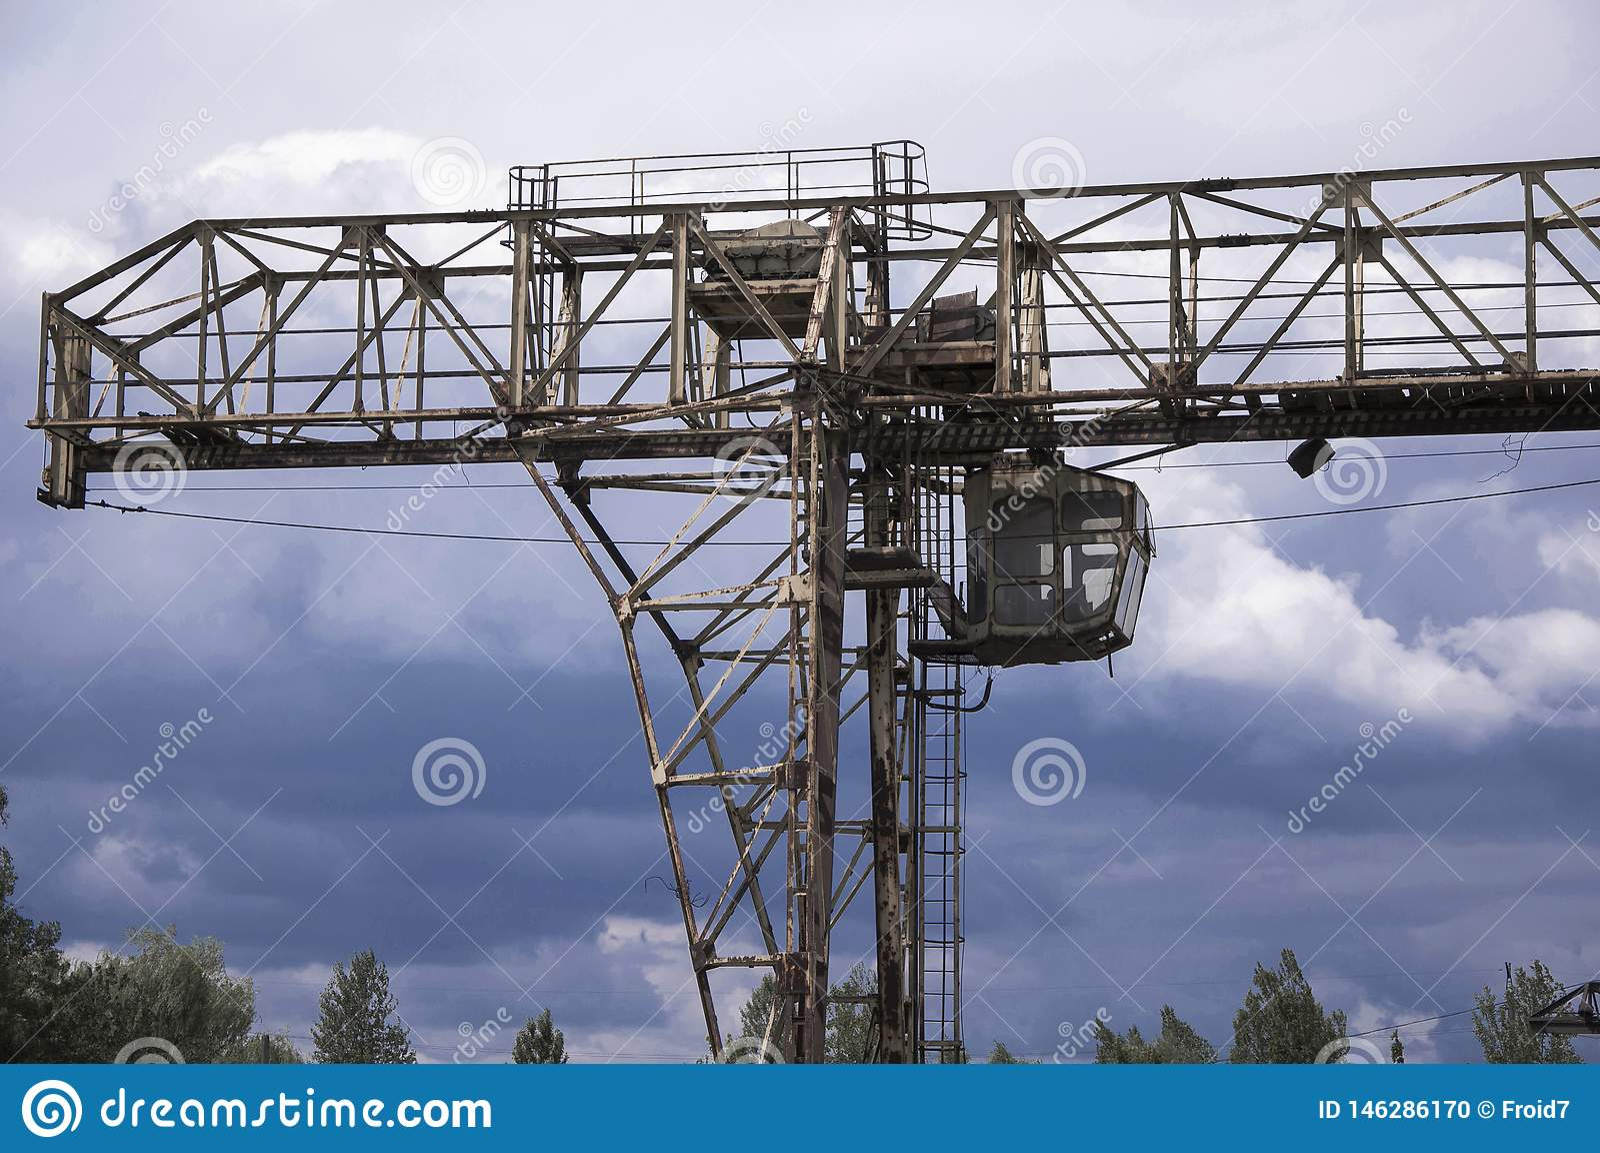 Old, broken gantry crane